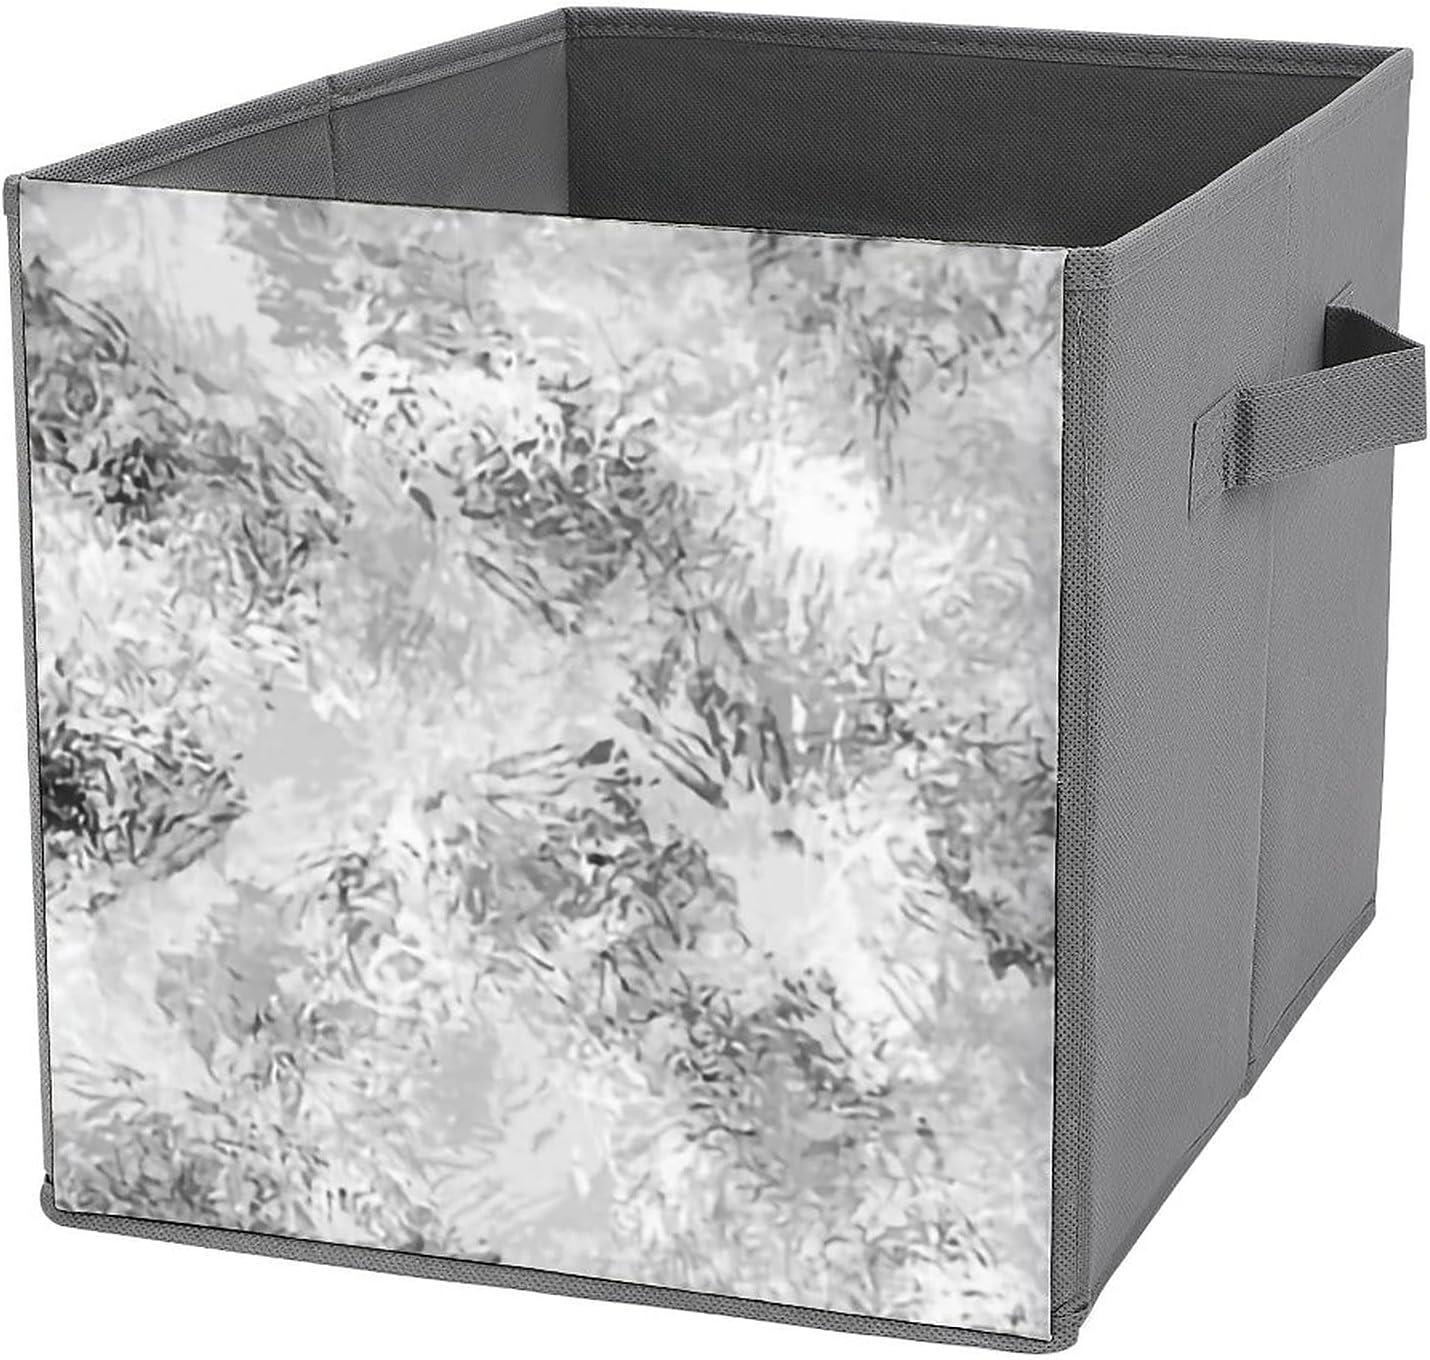 MMJUI Los Angeles Mall Brushwork Grey Folding Storage Arlington Mall Sto Collapsible Bins Fabric